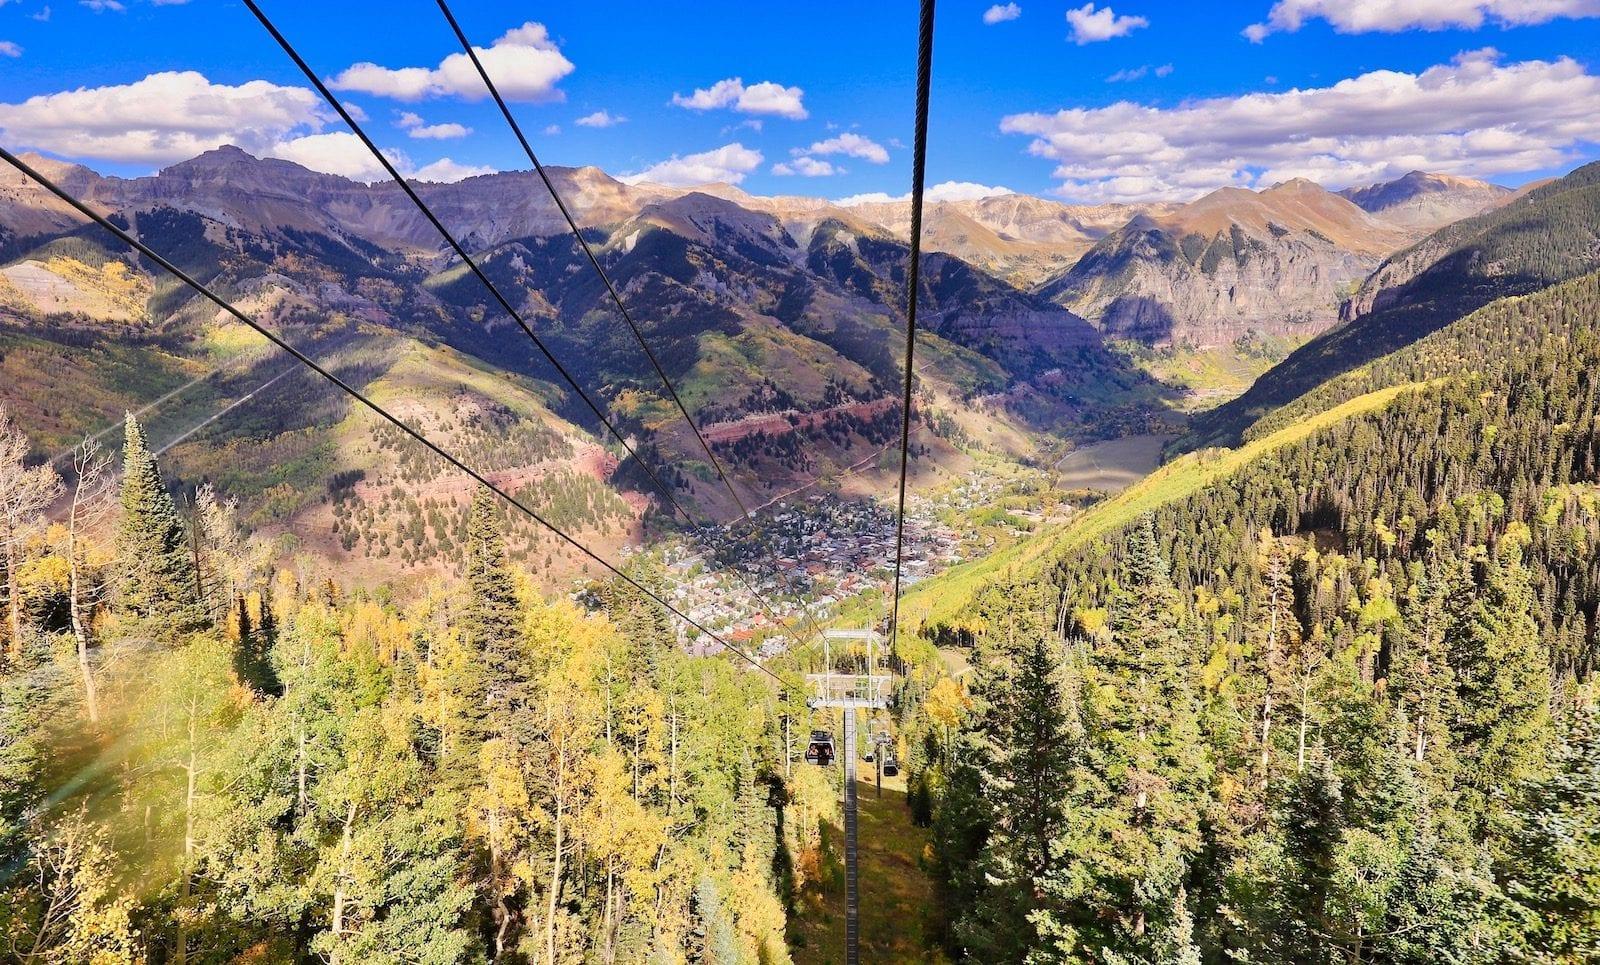 Taken from the free gondola over to Mountain Village at Telluride, Colorado